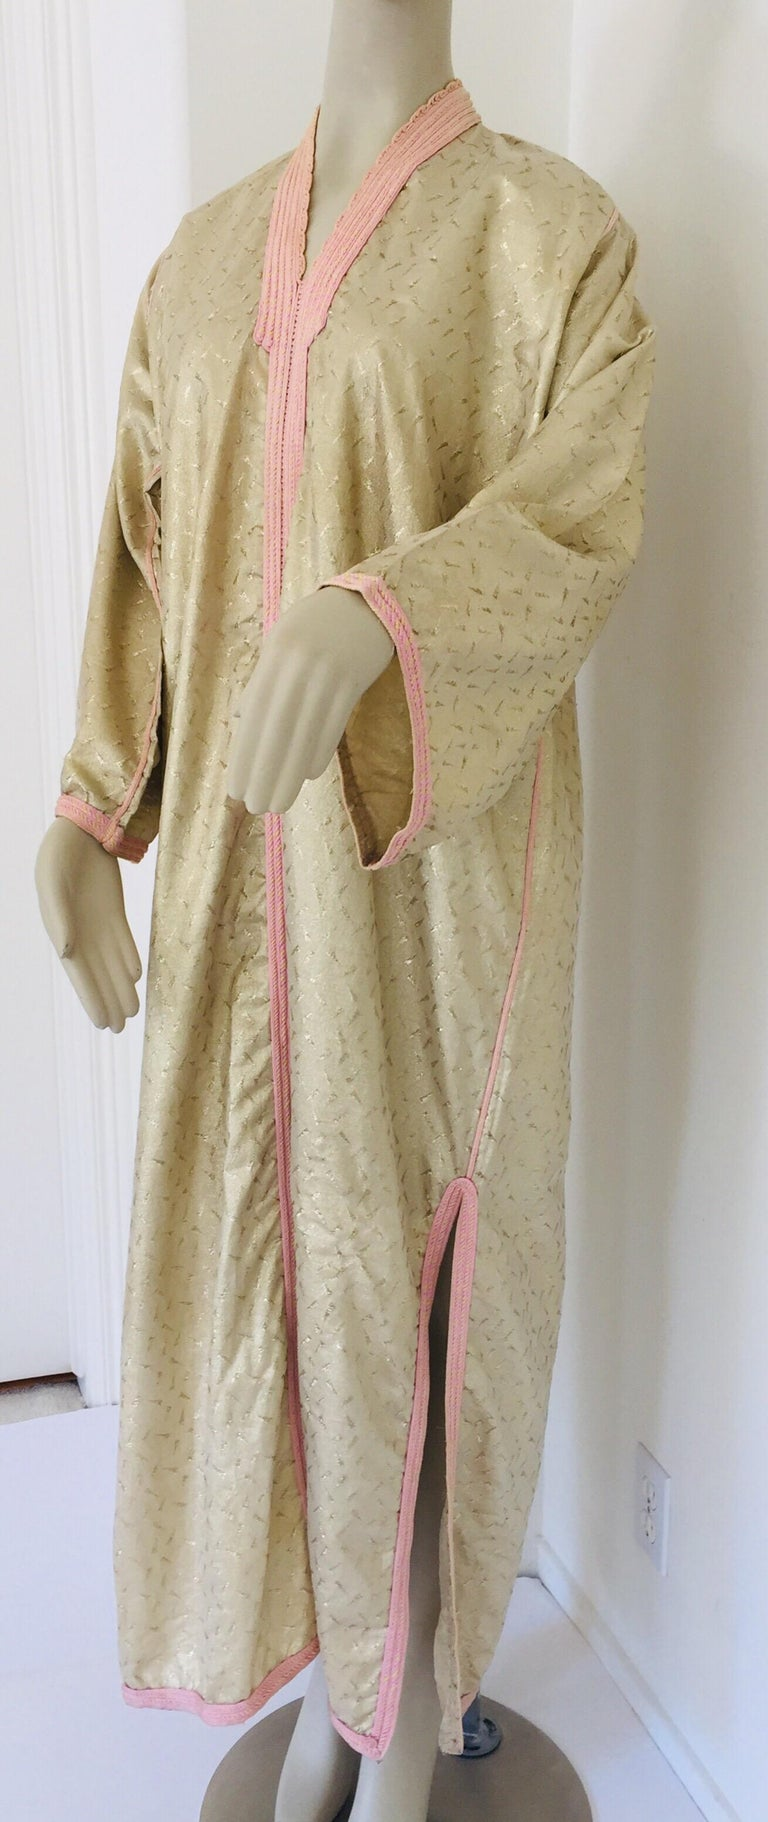 1970s Metallic Gold Moroccan Caftan, Kaftan Maxi Dress North Africa, Morocco For Sale 7